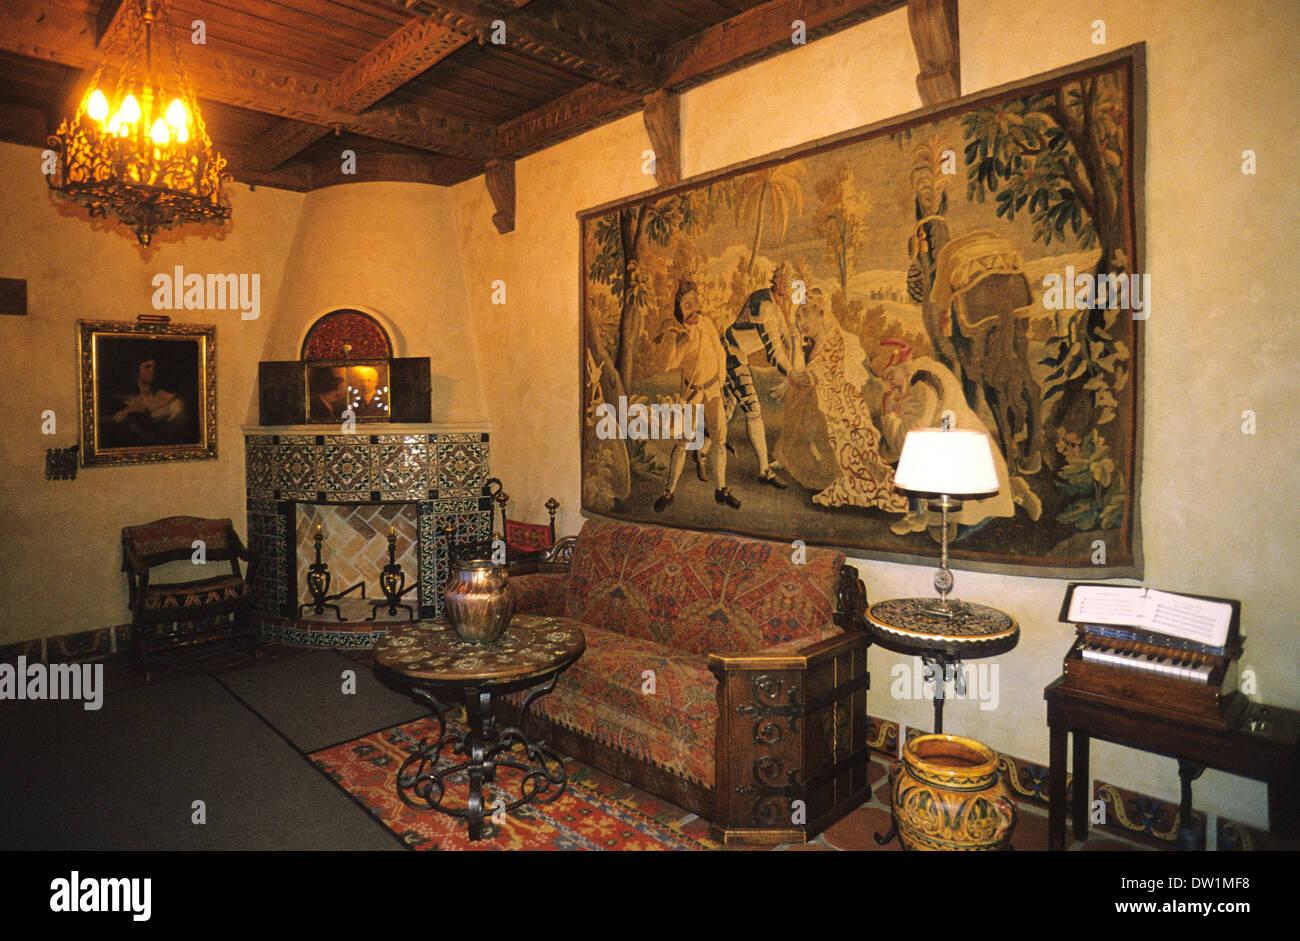 elk248 2084 california death valley national park scotty s castle rh alamy com 1925 bedroom Blue Attic Bedroom